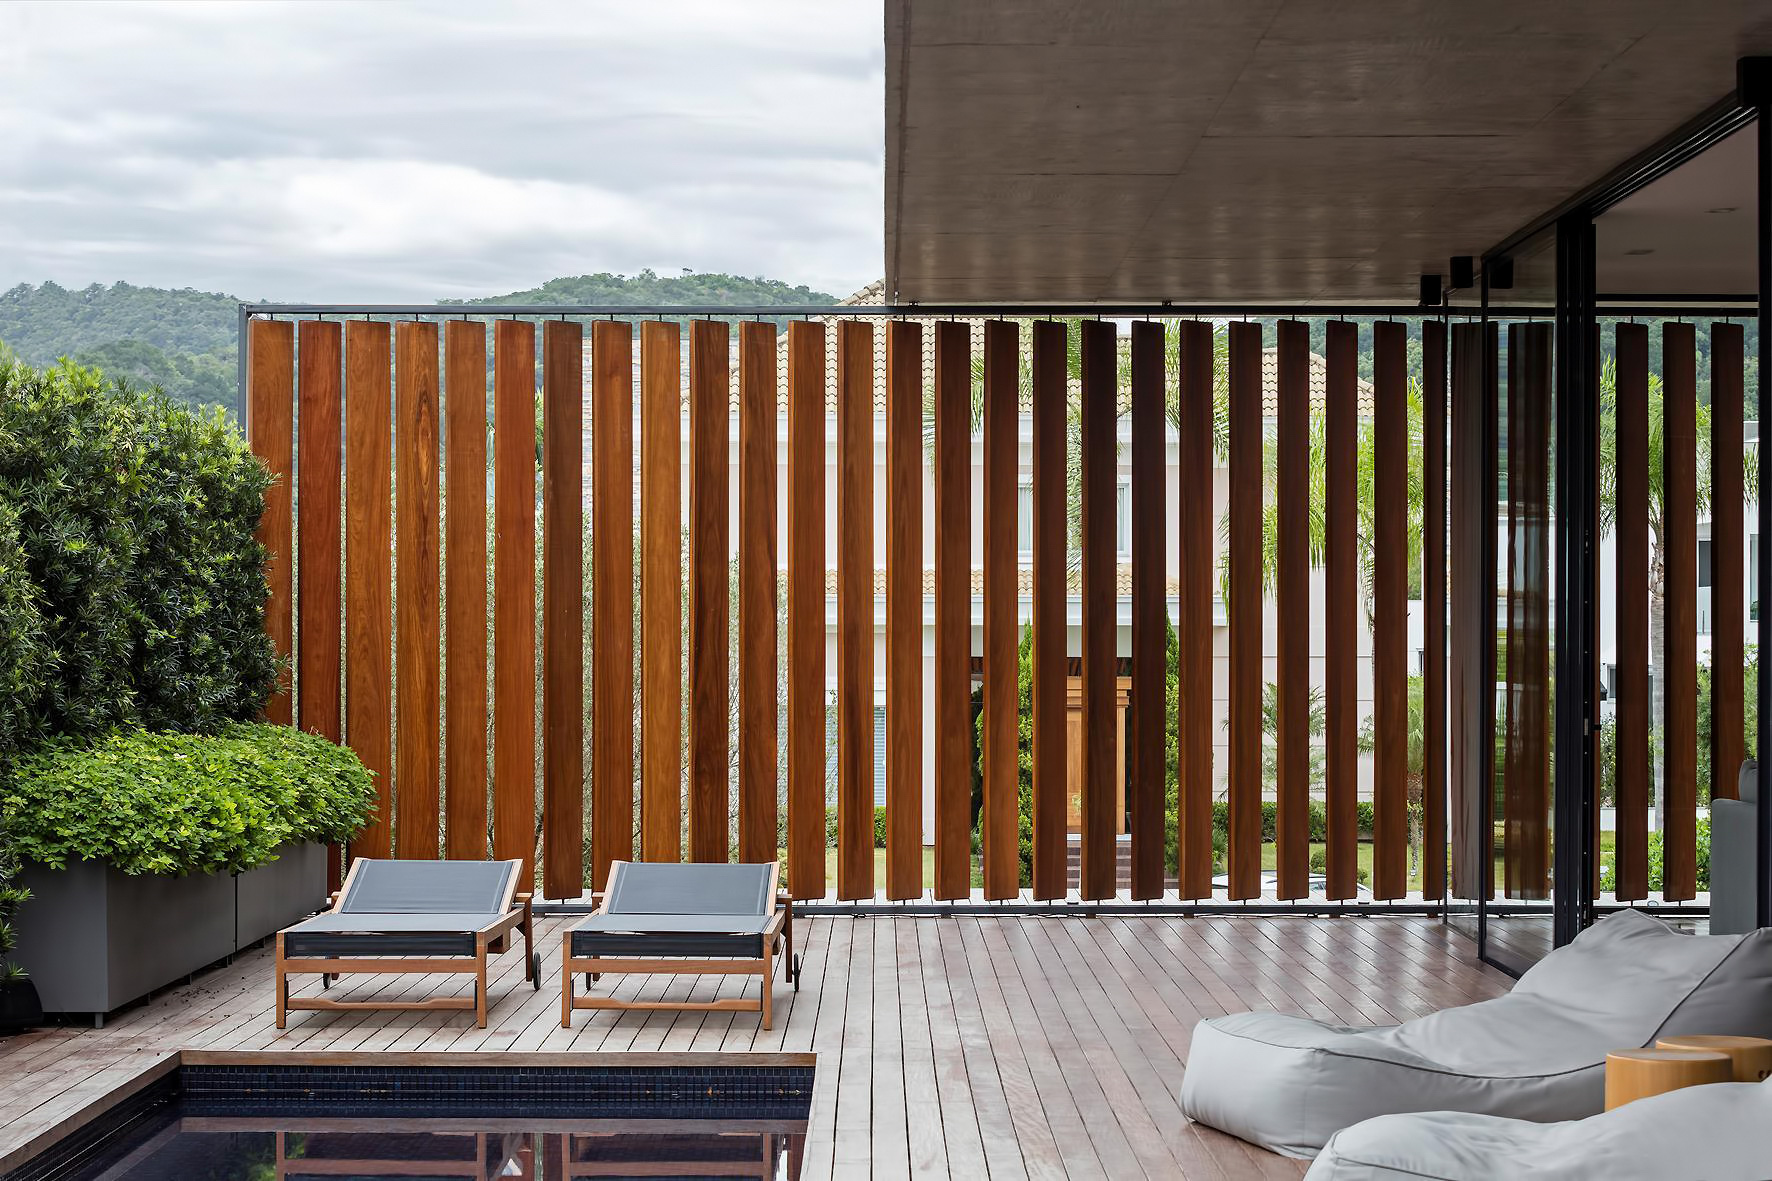 Casa Bravos Luxury Residence - Itajaí, Santa Catarina, Brazil